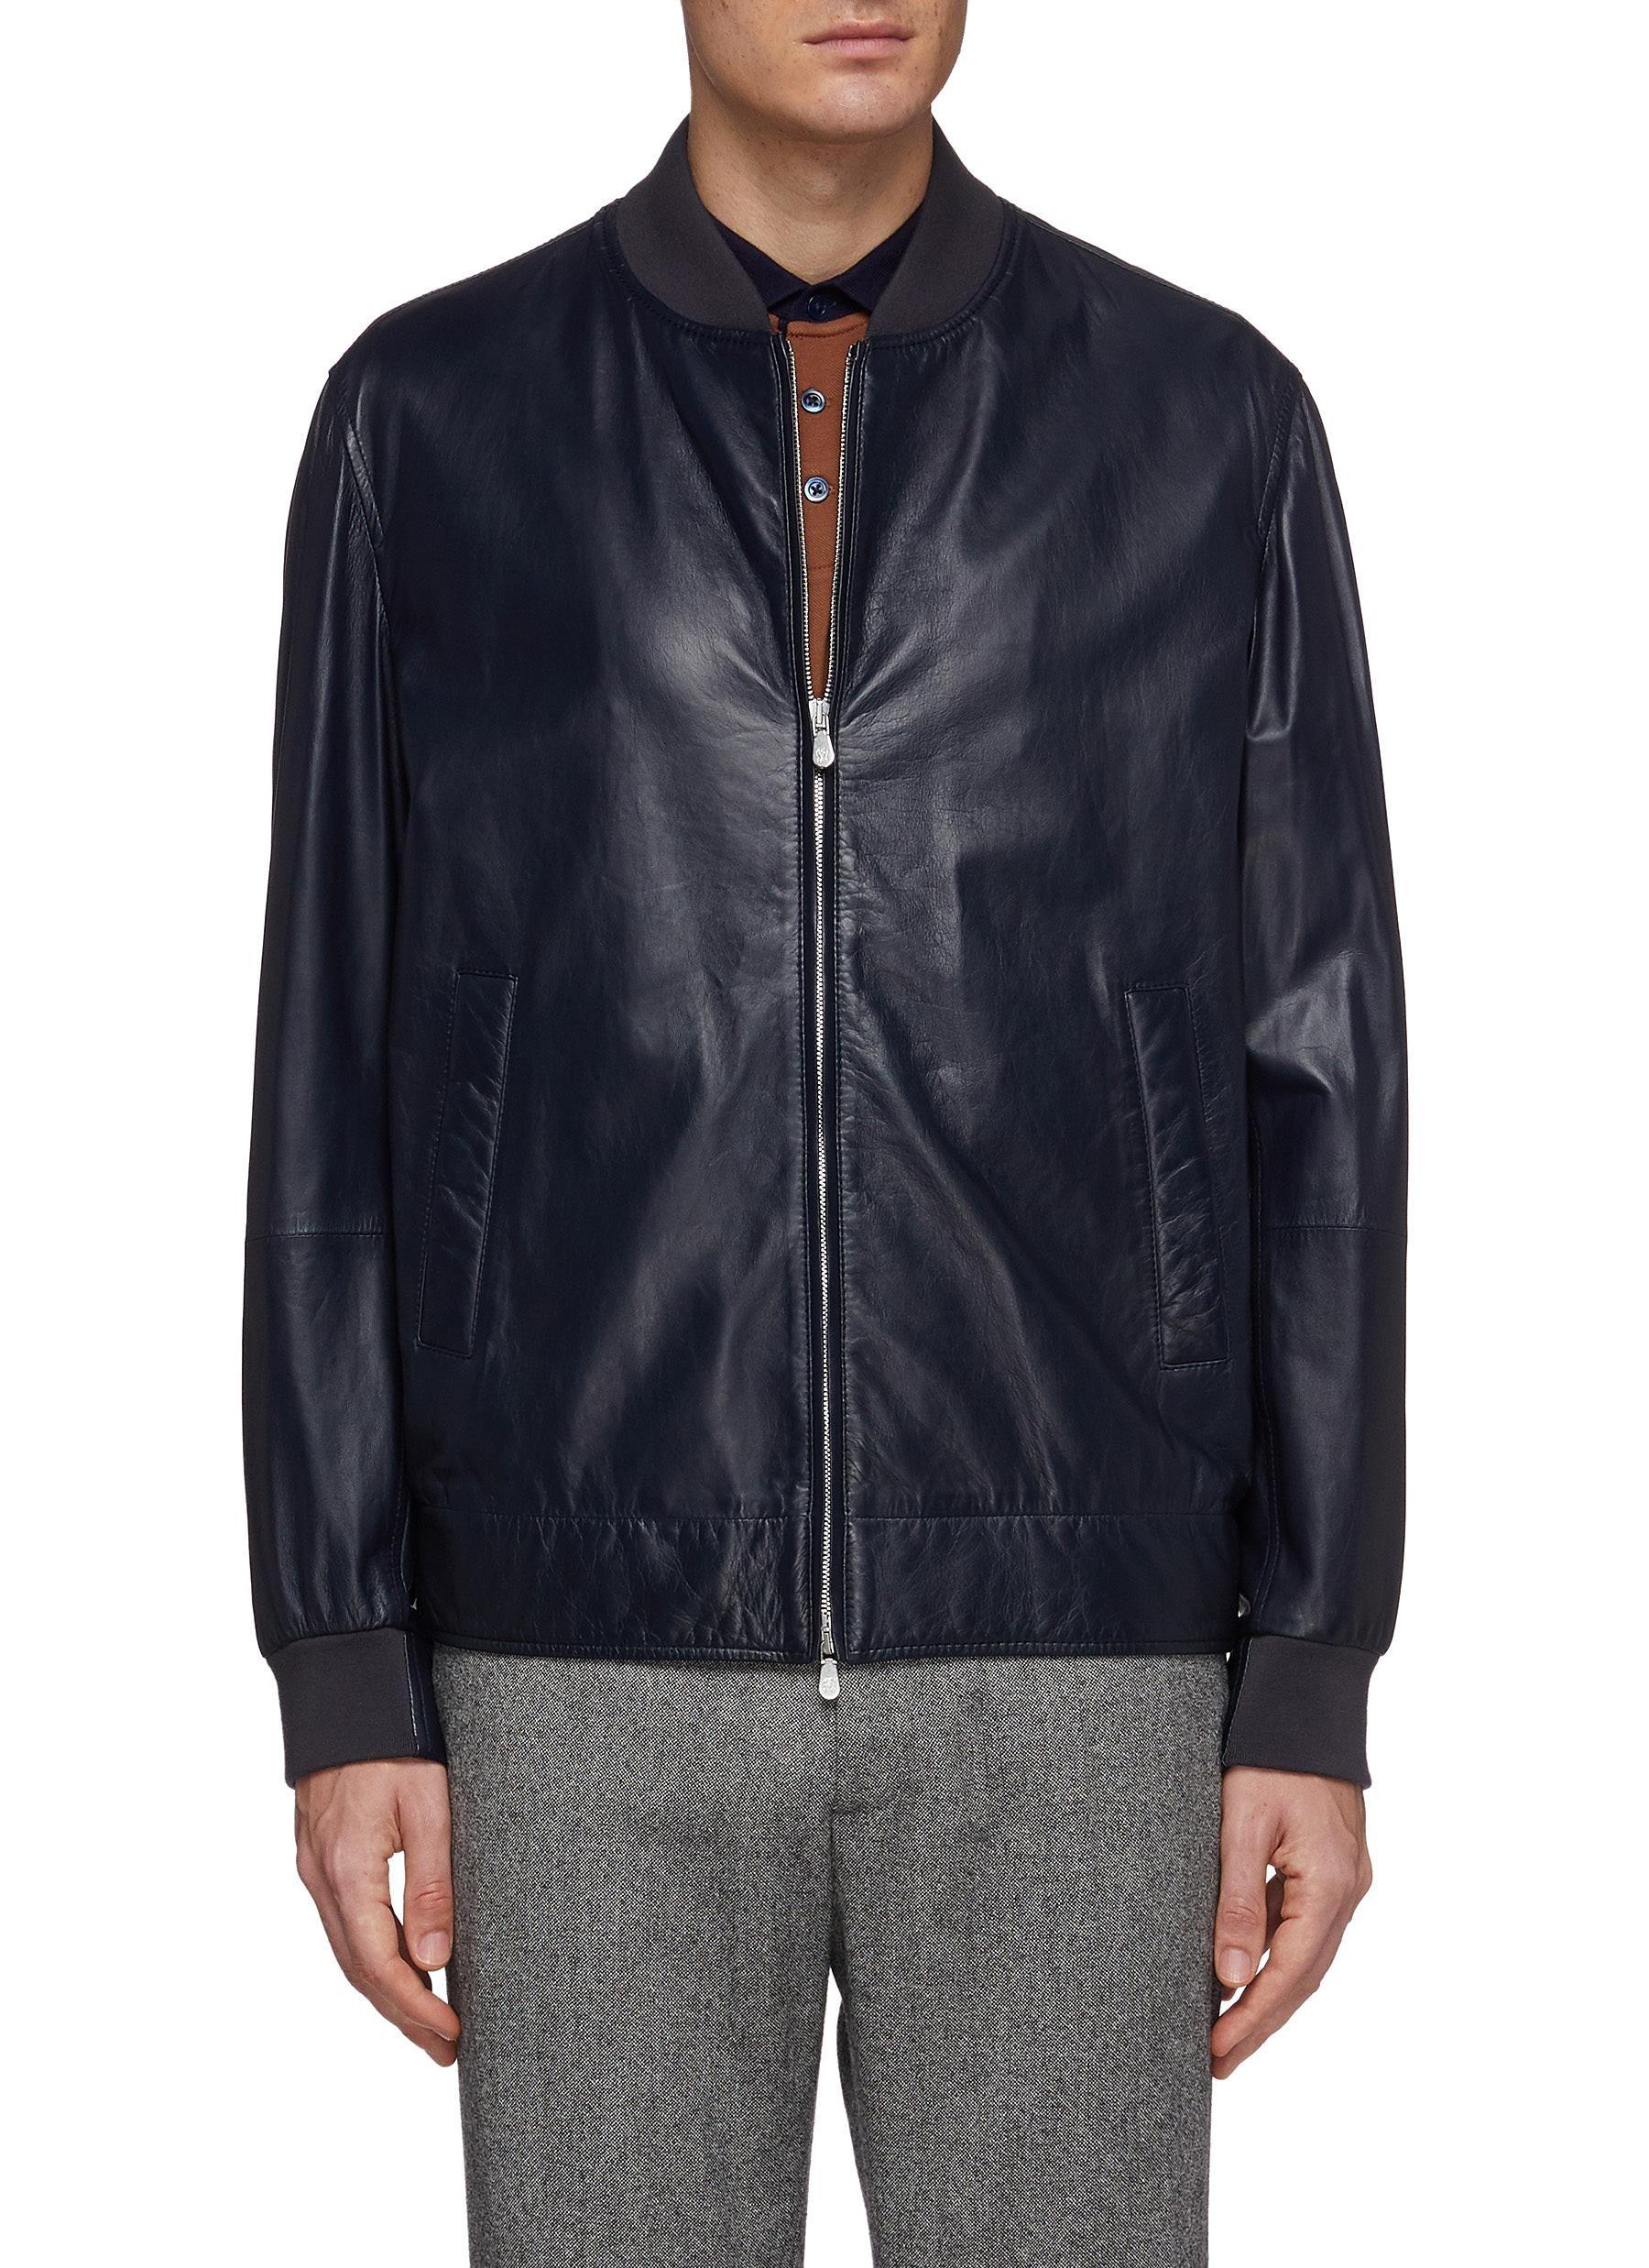 Brunello Cucinelli Leather Bomber Jacket Modesens Leather Bomber Jacket Bomber Jacket Leather Bomber [ 2475 x 1800 Pixel ]